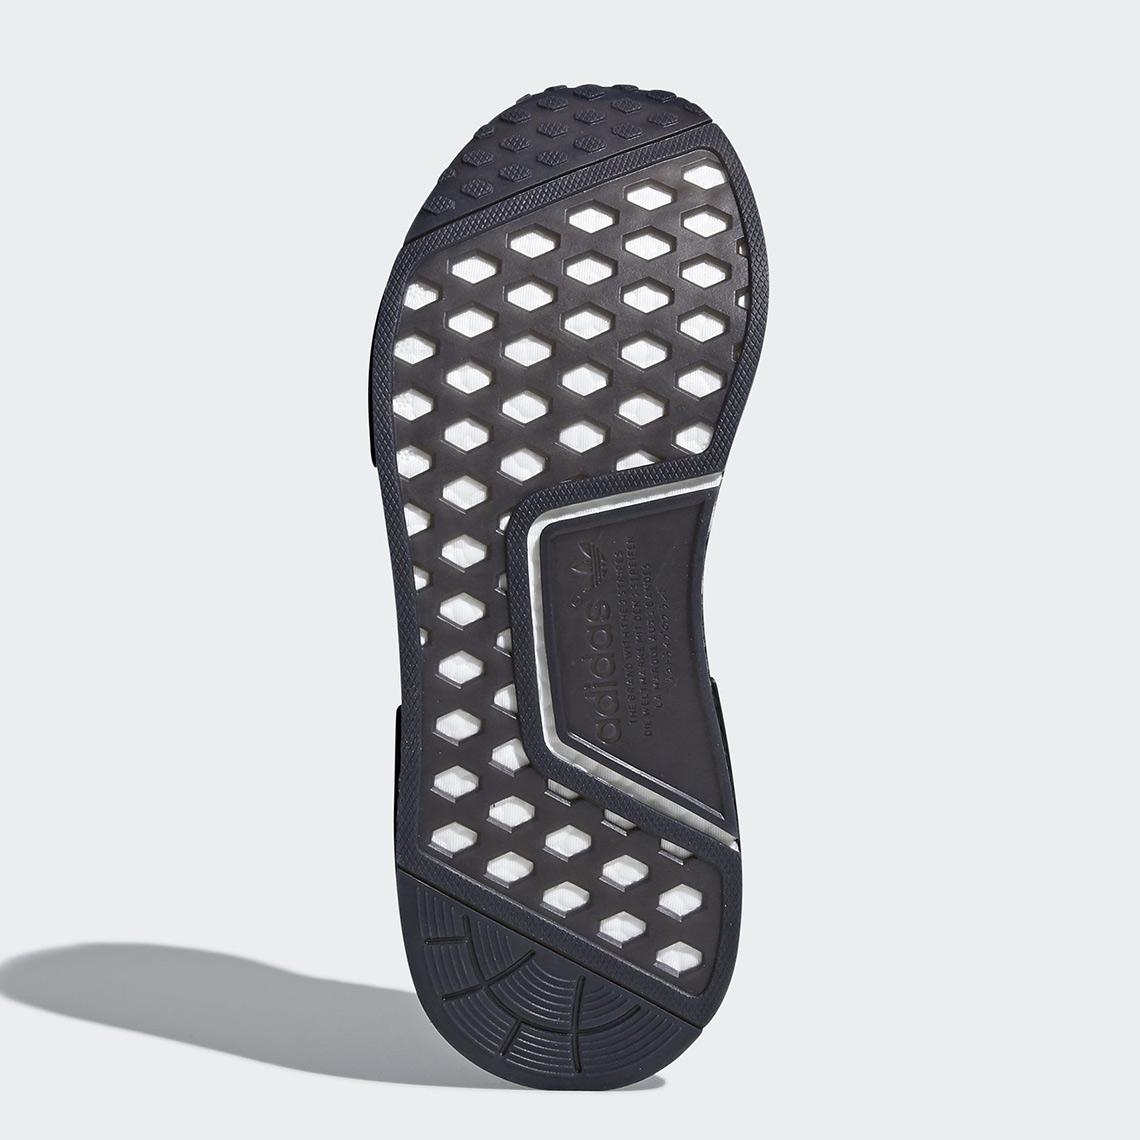 Adidas Nmd R1 Stlt Trippel Svart 26zmH